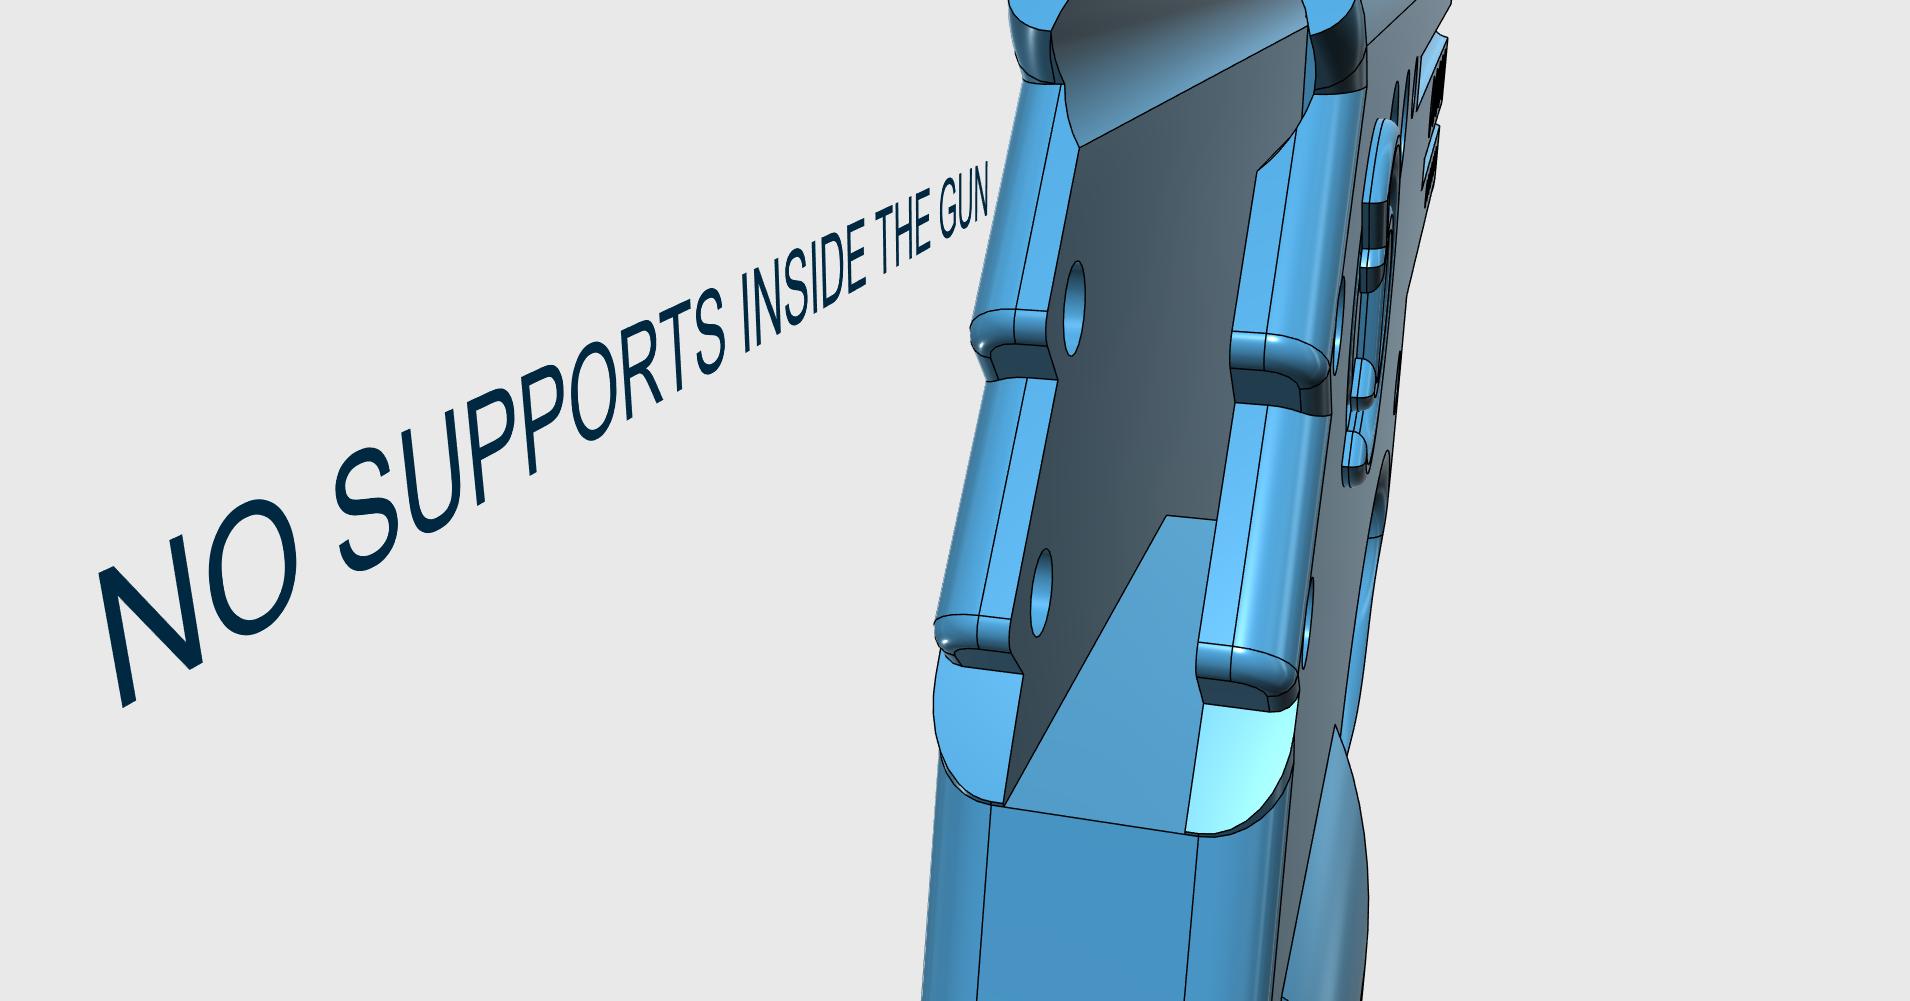 INFO SUPPORT1.png Download STL file GUN SHOOTS RUBBERBAND  • 3D printing object, JonathanOlivarDizon